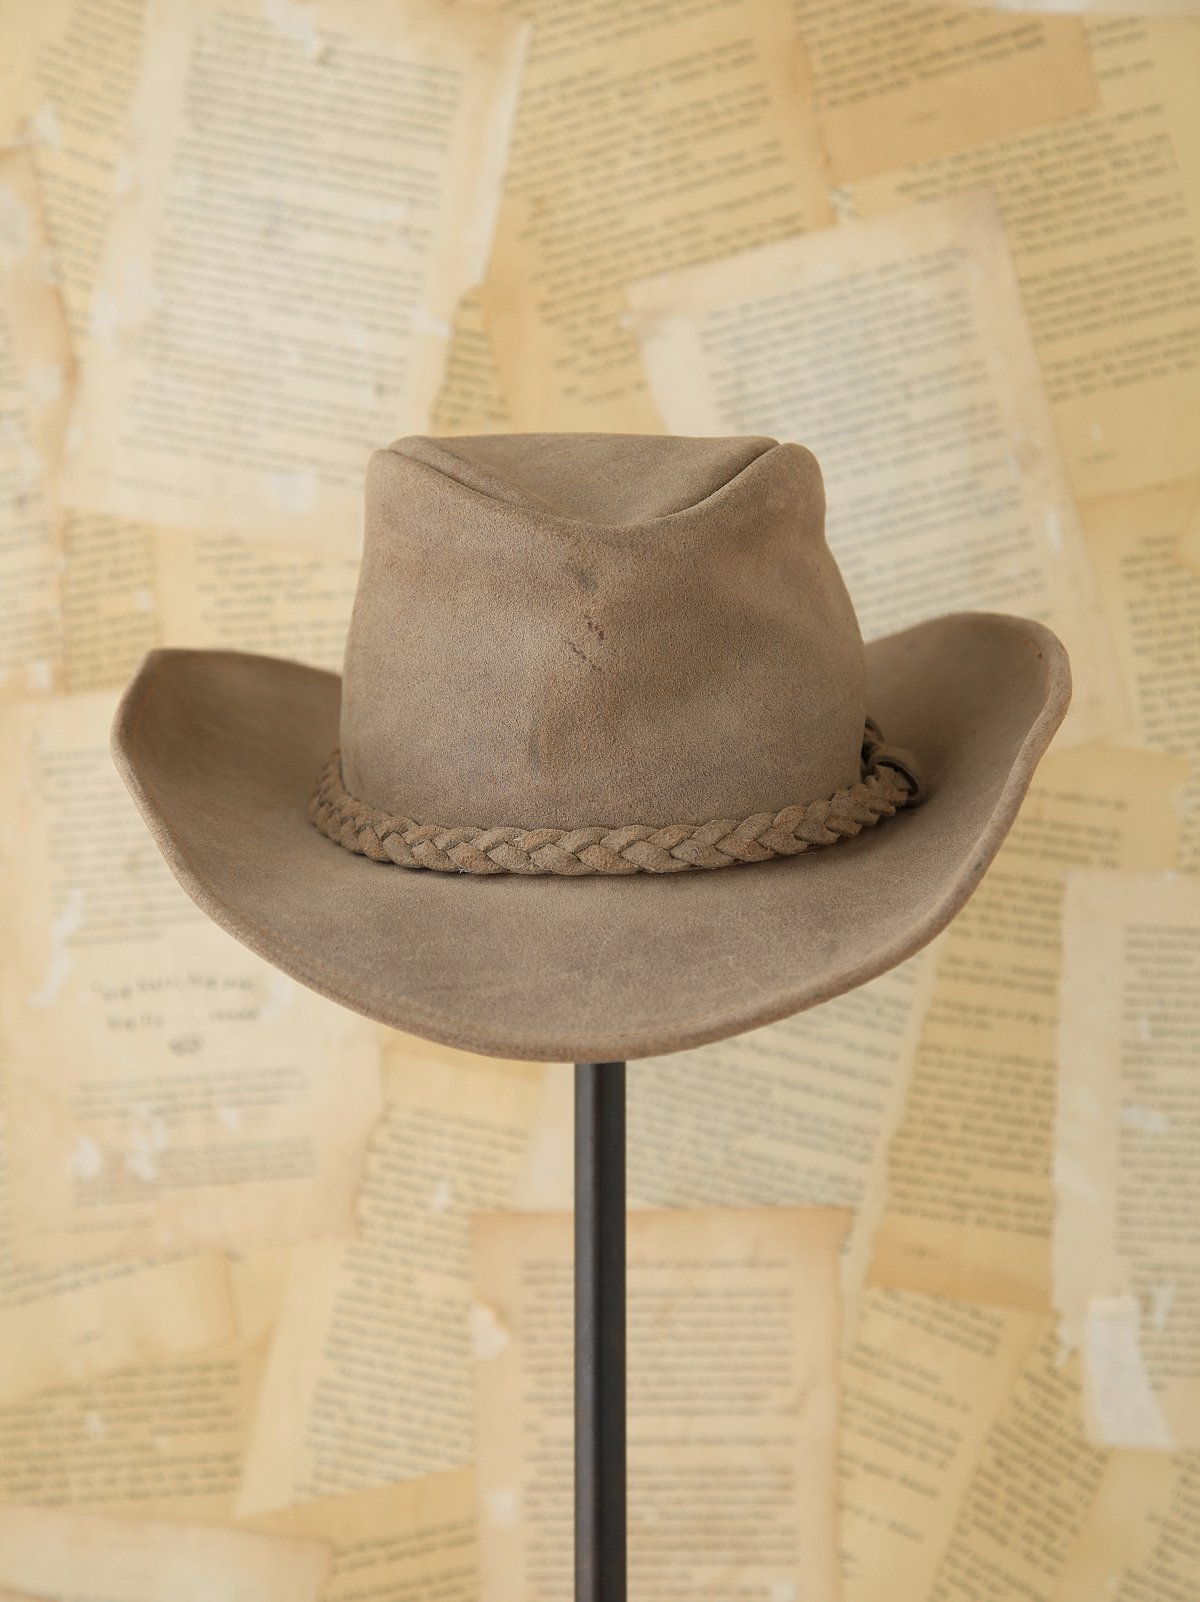 Vintage 1970s Distressed Leather Hat